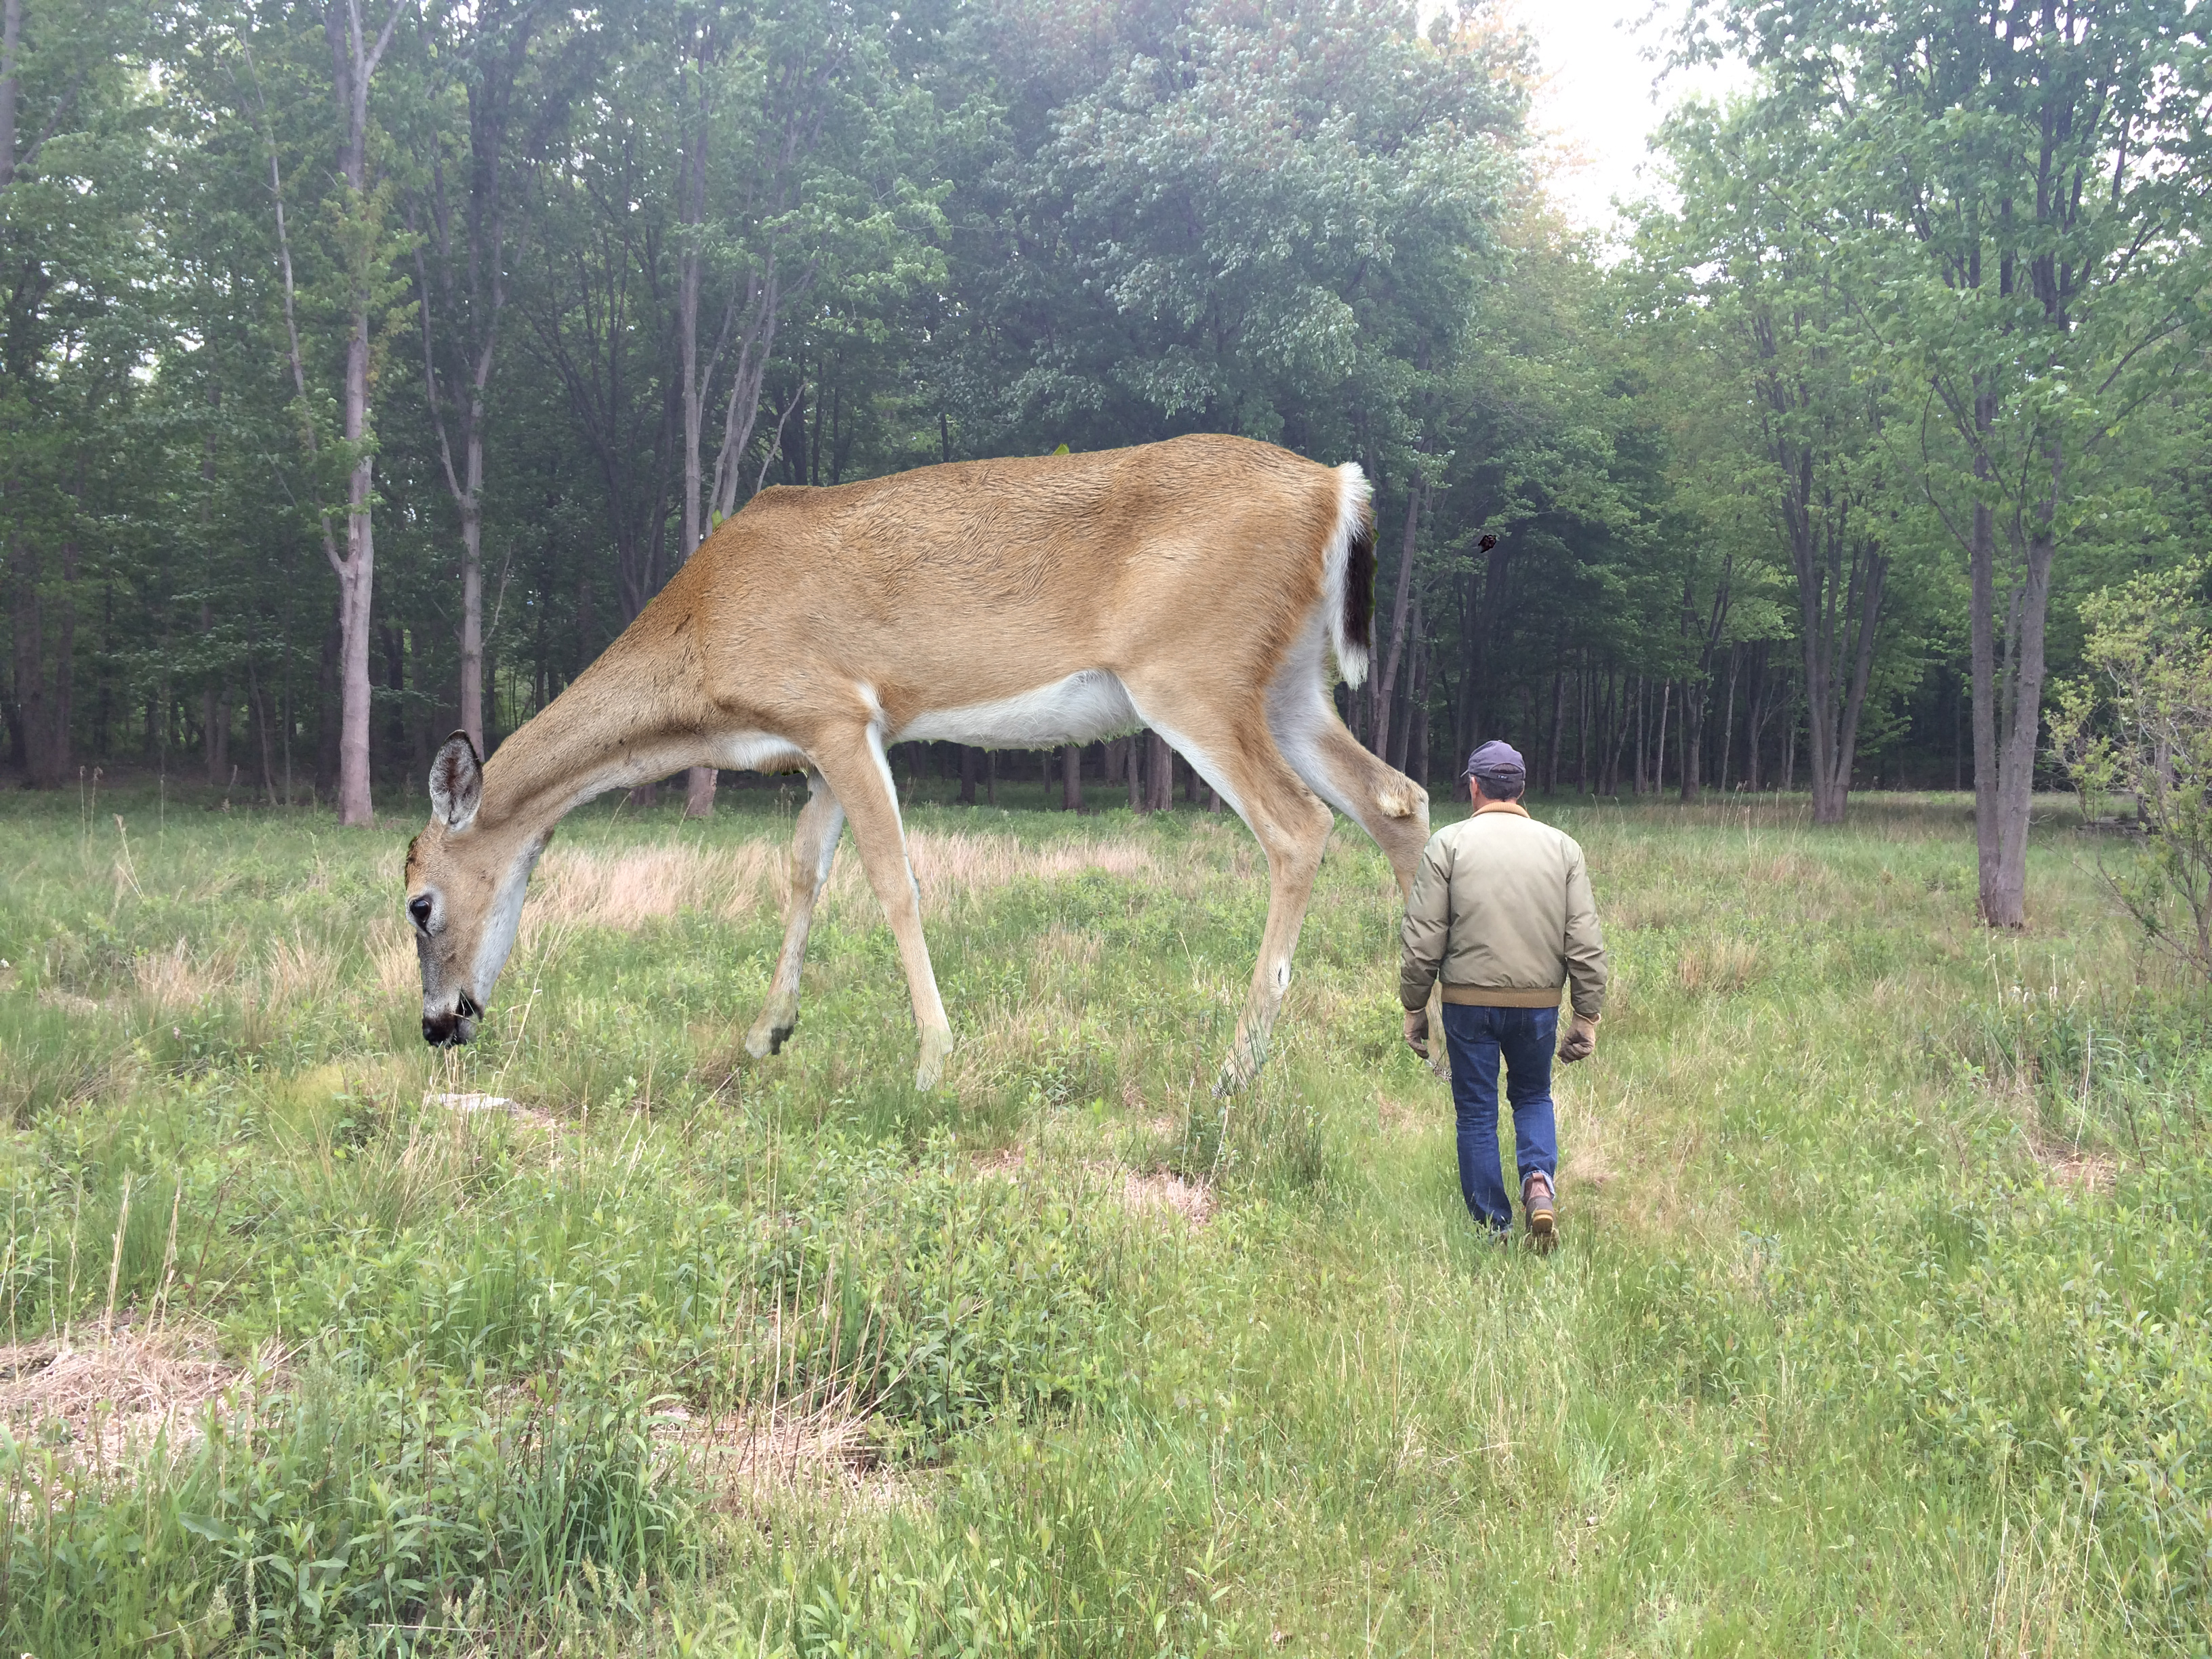 Tony Tasset, Deer, 2015.